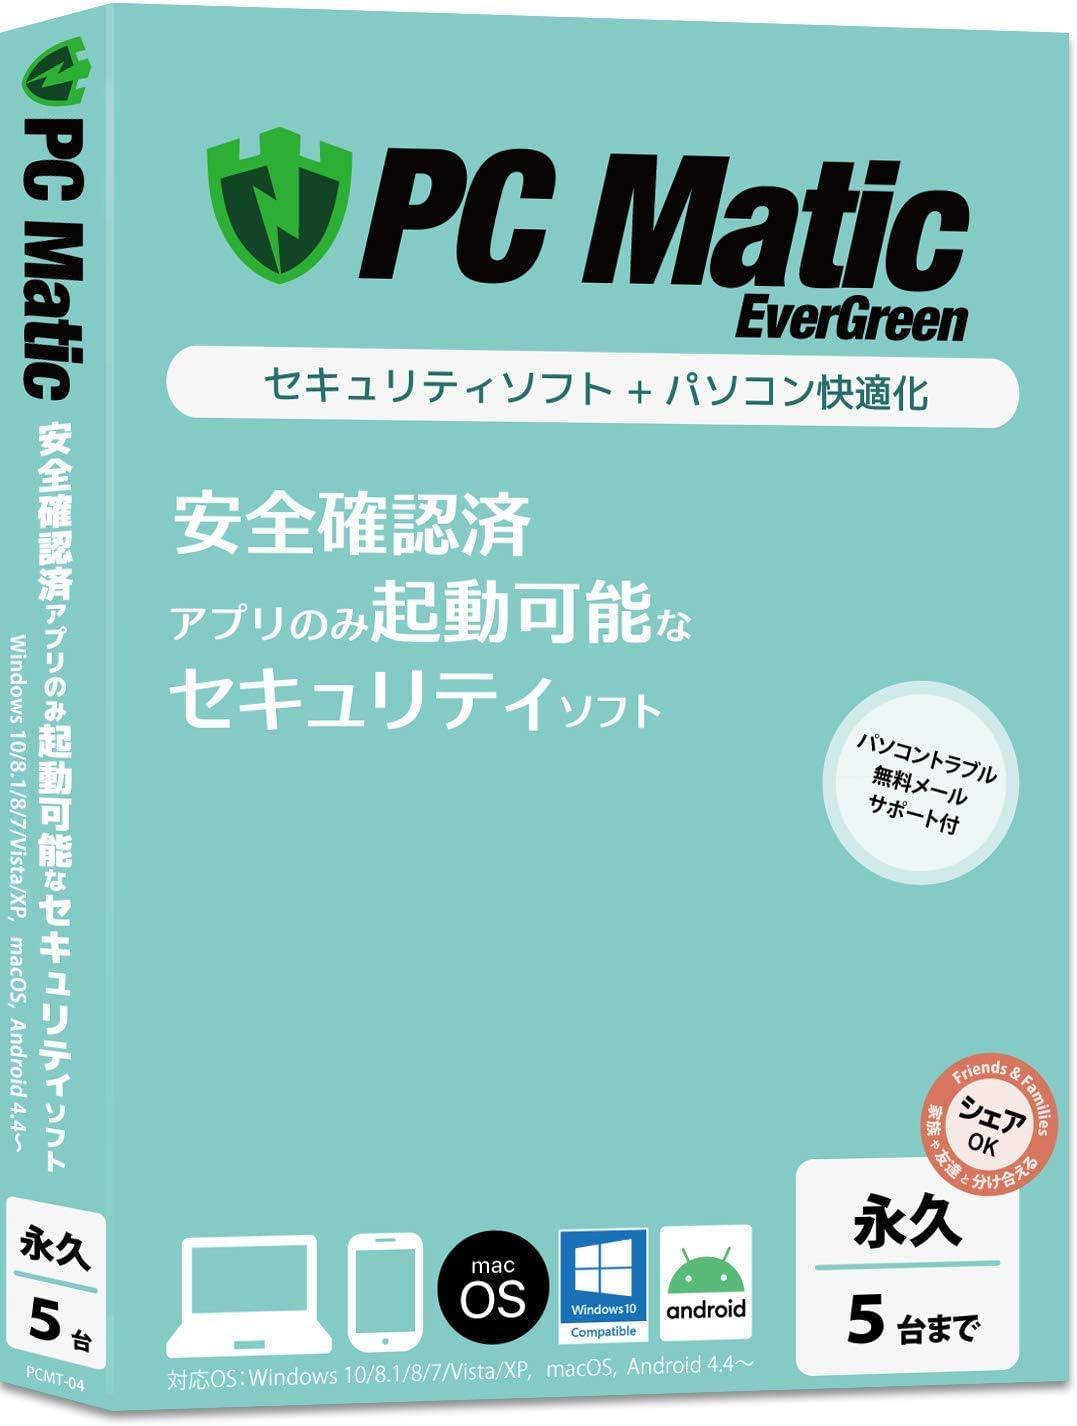 PC Matic 安全確認済みアプリのみ起動可能なセキュリティソフト